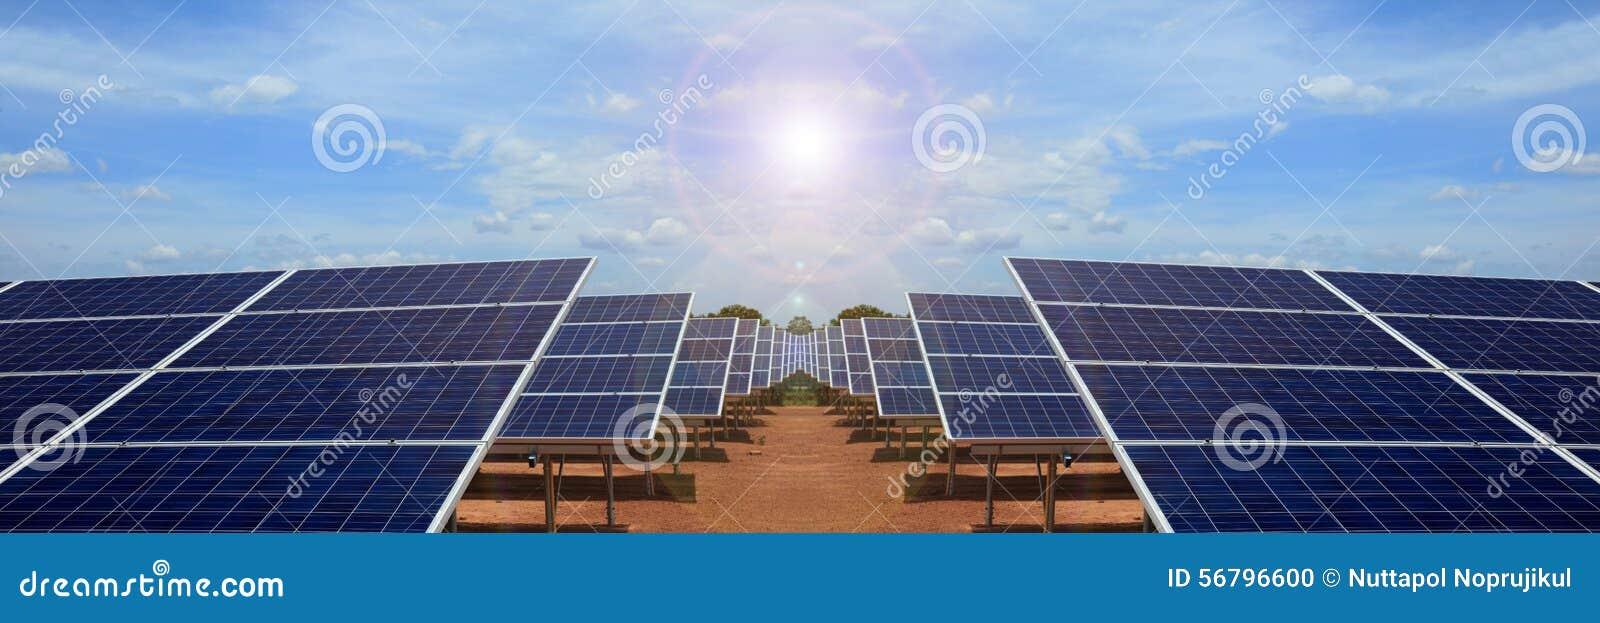 Power plant using renewable solar energy on blue sky cloud.